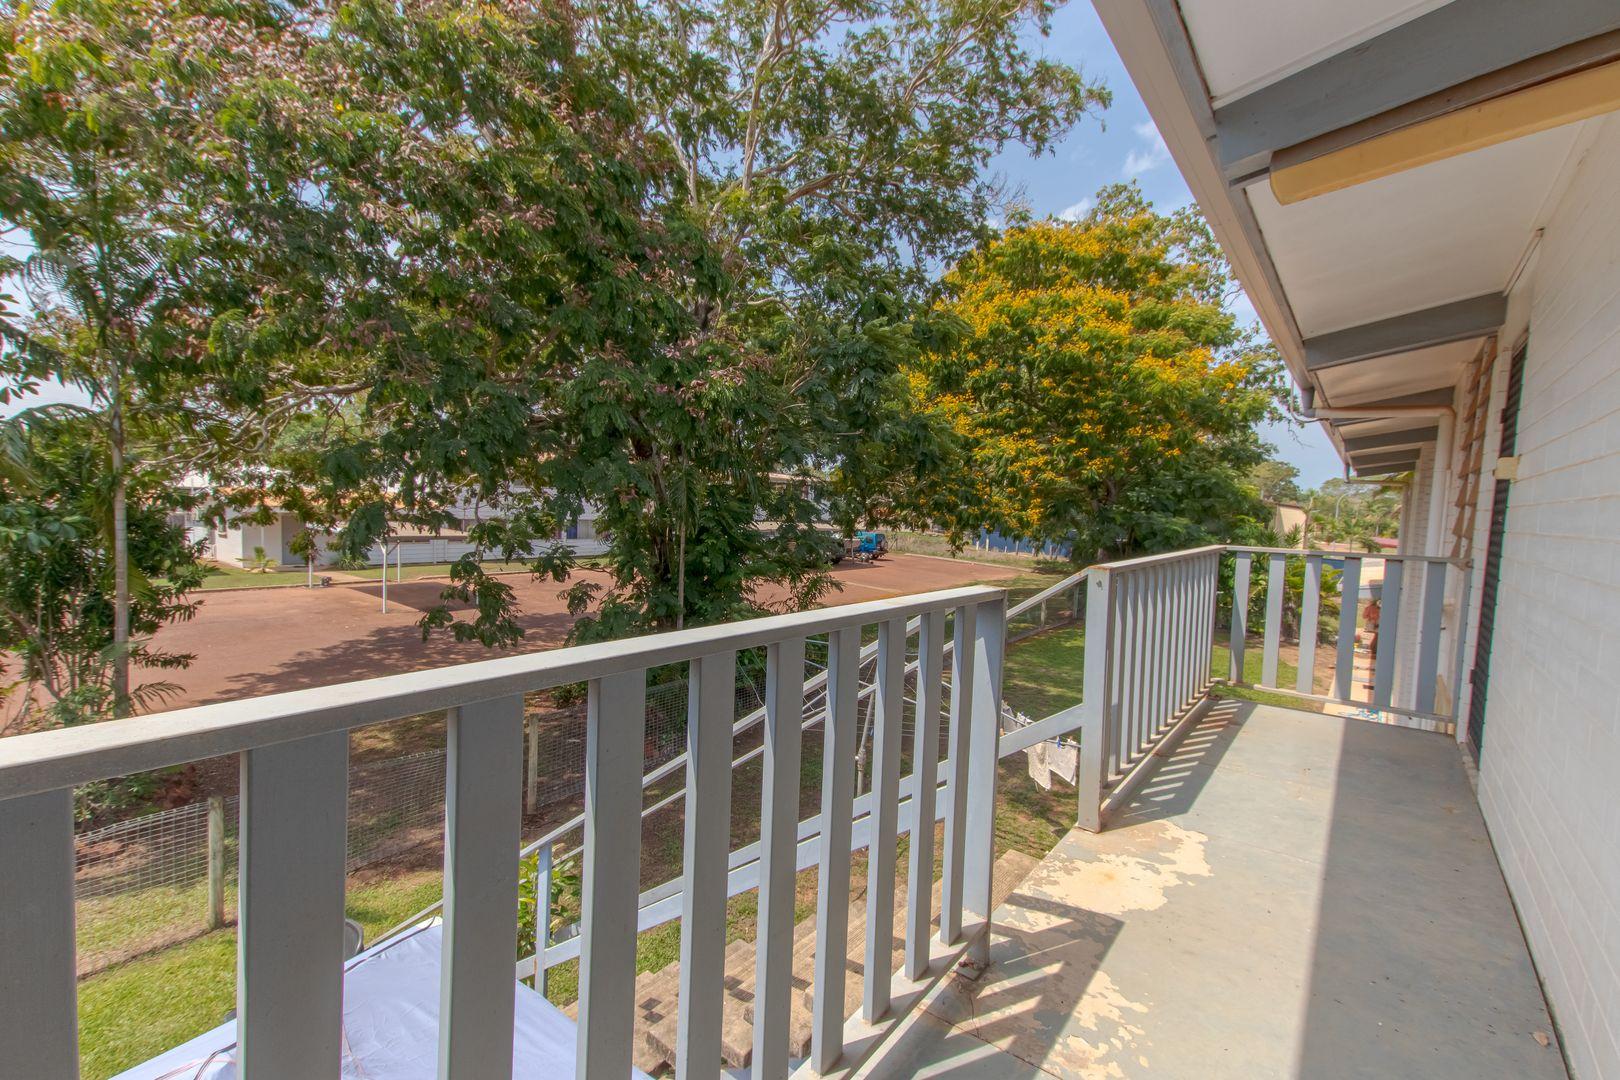 U1/50 Deplanchea Terrace, Weipa QLD 4874, Image 0